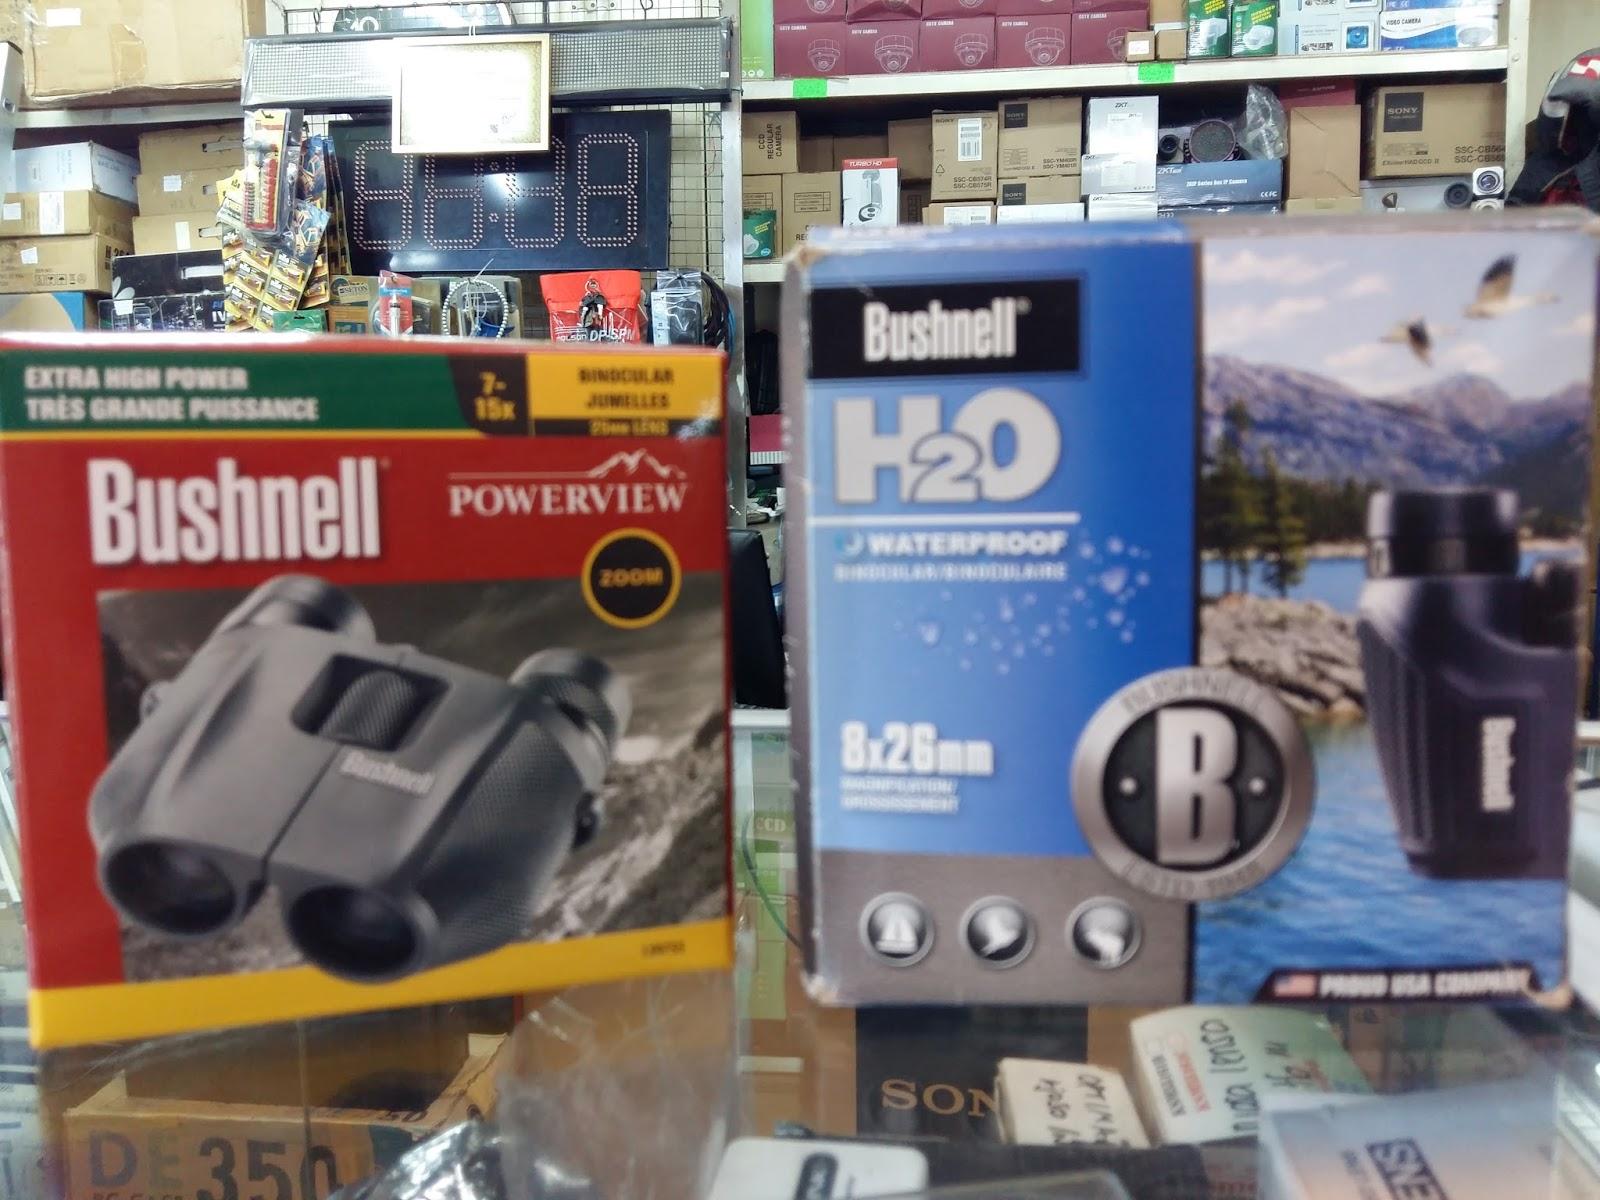 Fluke 772 Milliamp Clamp Meter My Product Smart Sensor Ar861 Laser Distance 60m Untuk Harga Silahkan Hubungi Gmai Ivansuryatech18gmailcom Hp 089649464999 Bbm 59a272fd